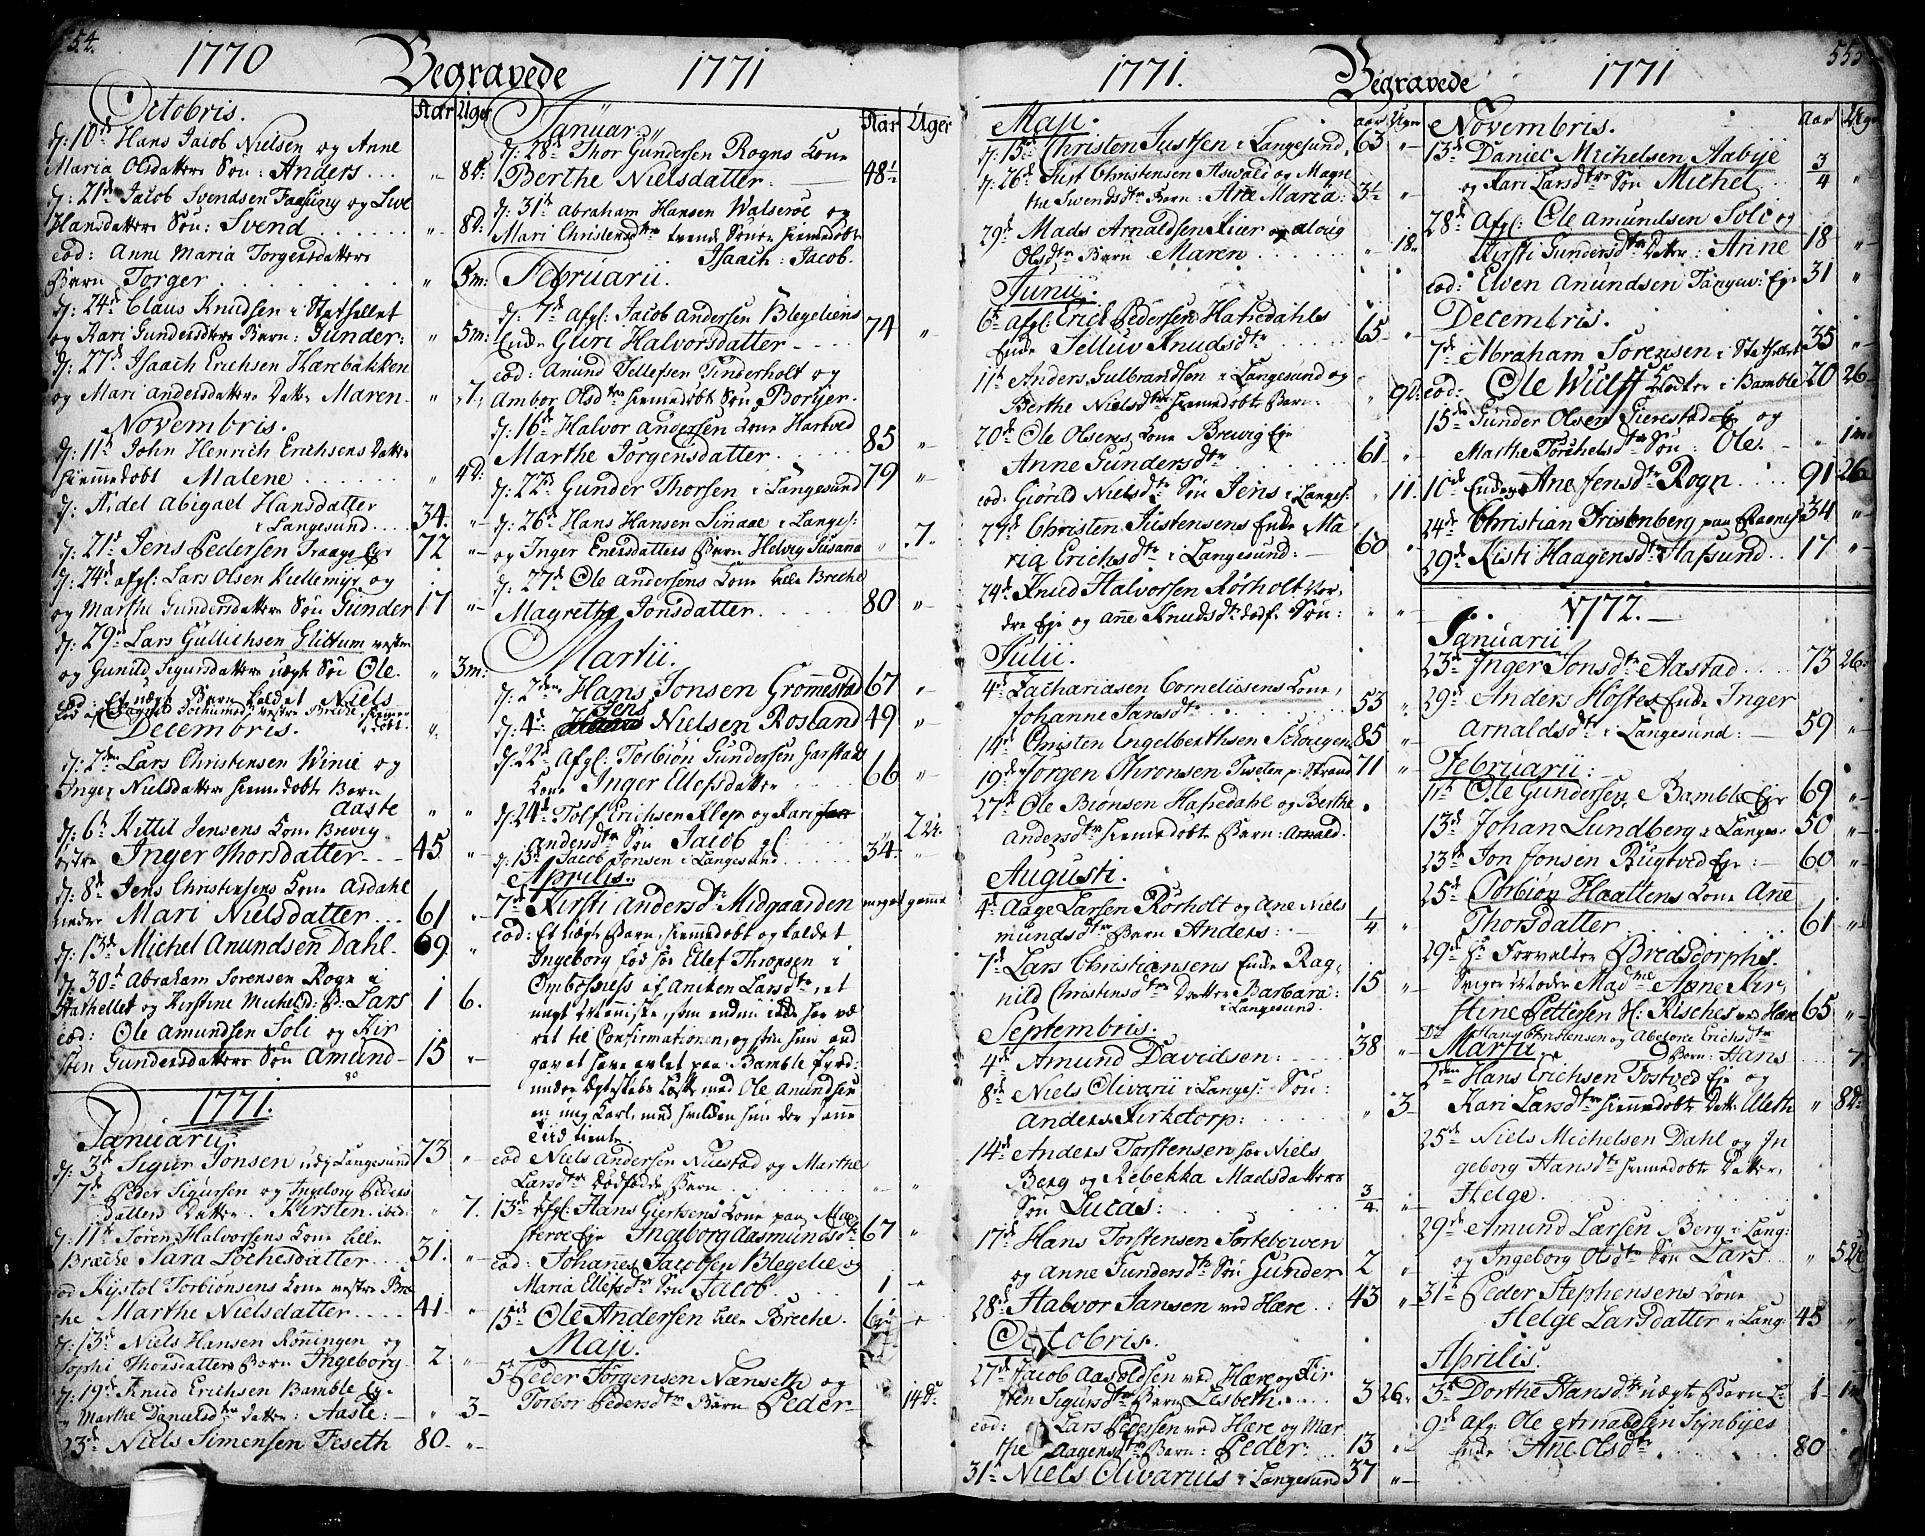 SAKO, Bamble kirkebøker, F/Fa/L0001: Ministerialbok nr. I 1, 1702-1774, s. 554-555